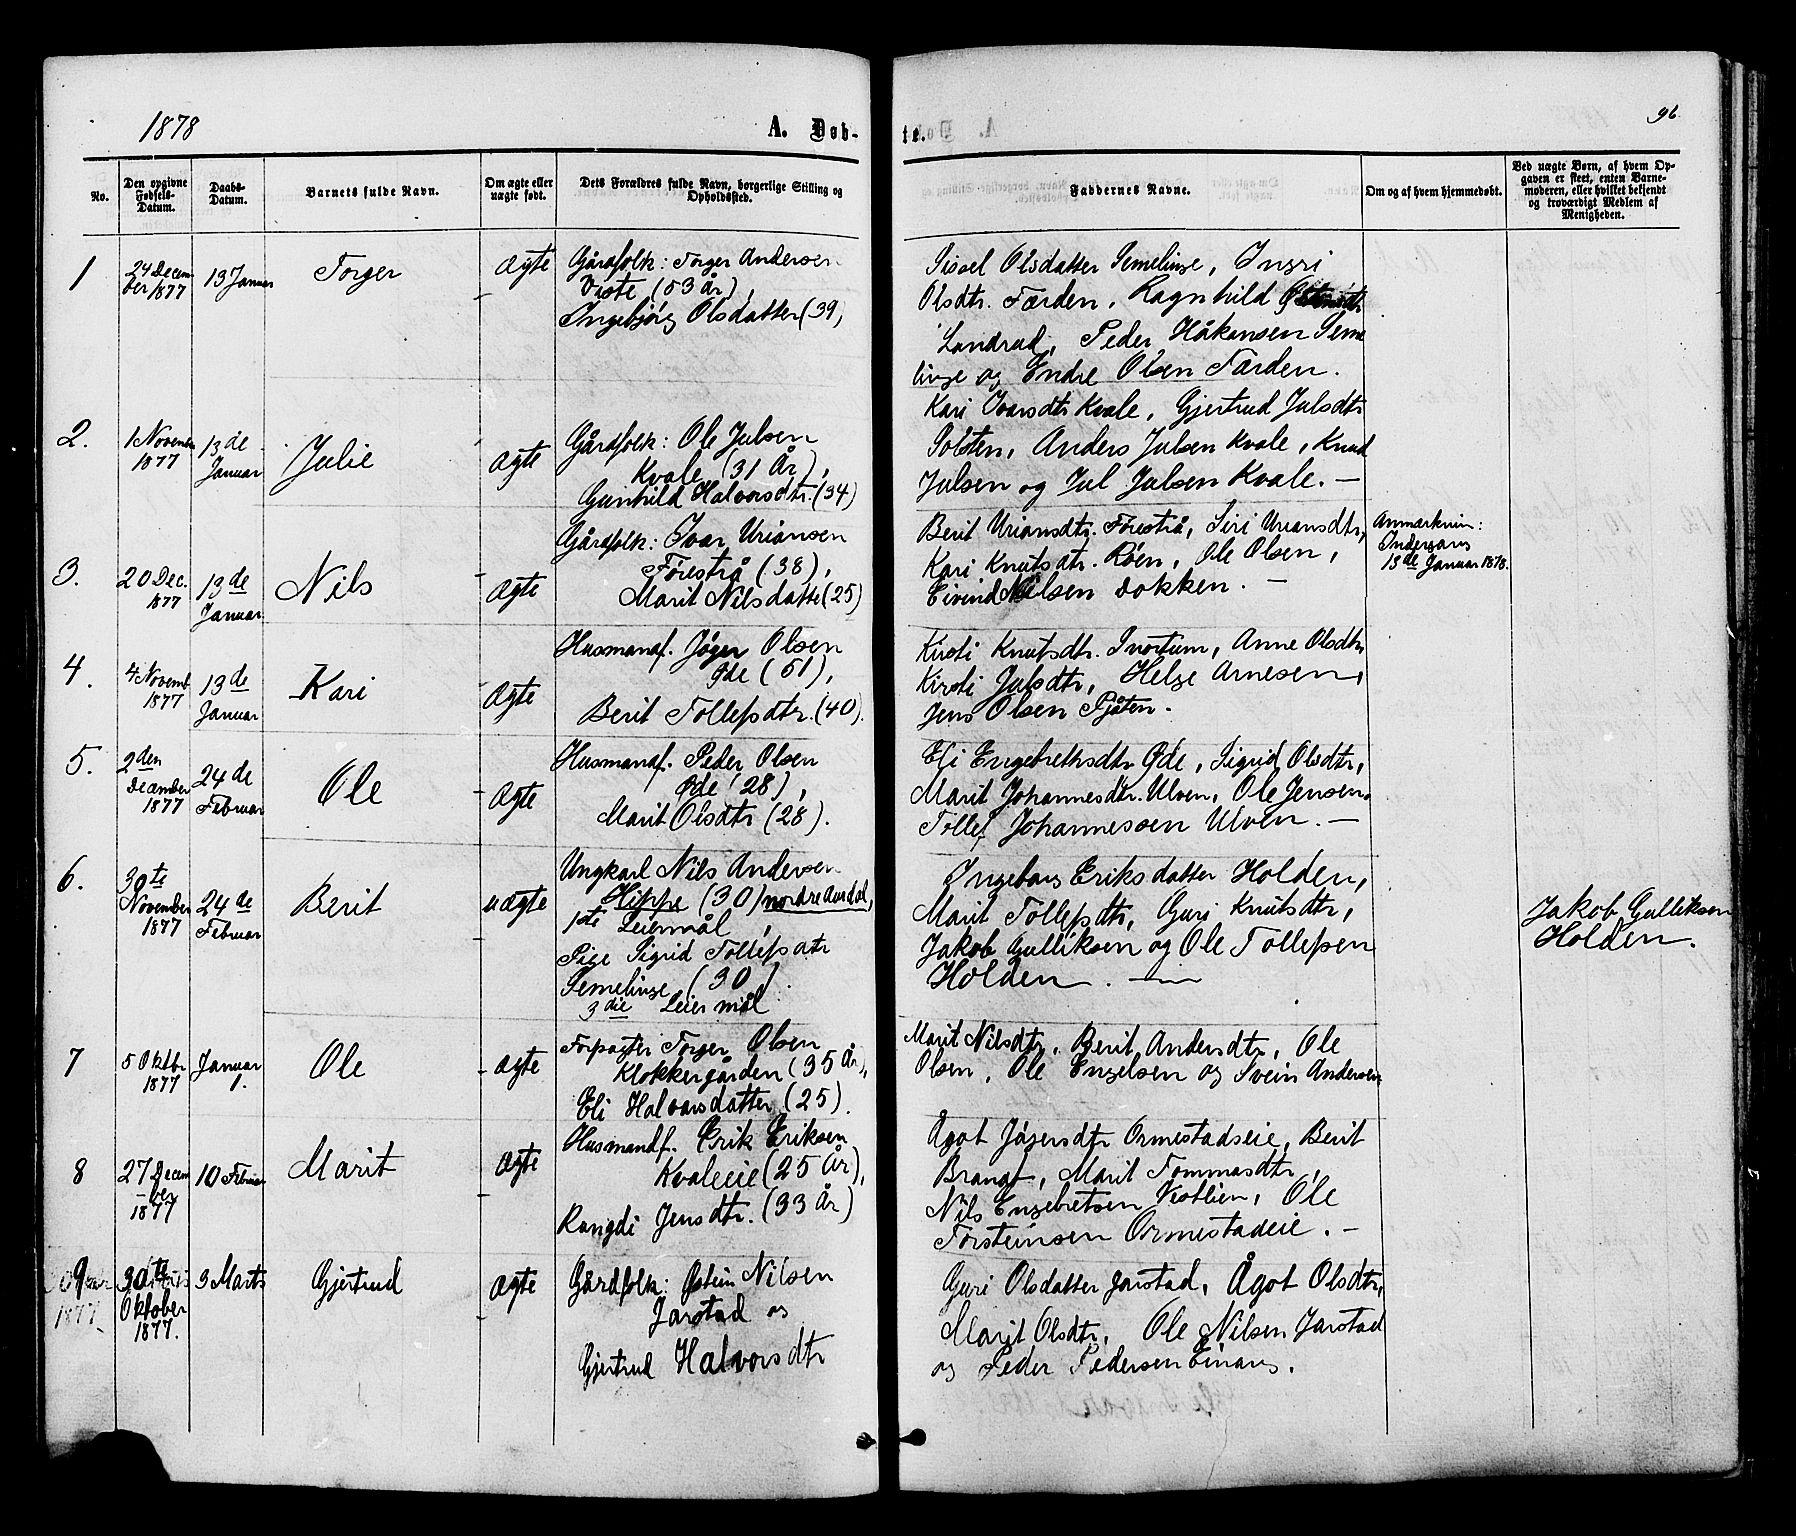 SAH, Vestre Slidre prestekontor, Ministerialbok nr. 3, 1865-1880, s. 96